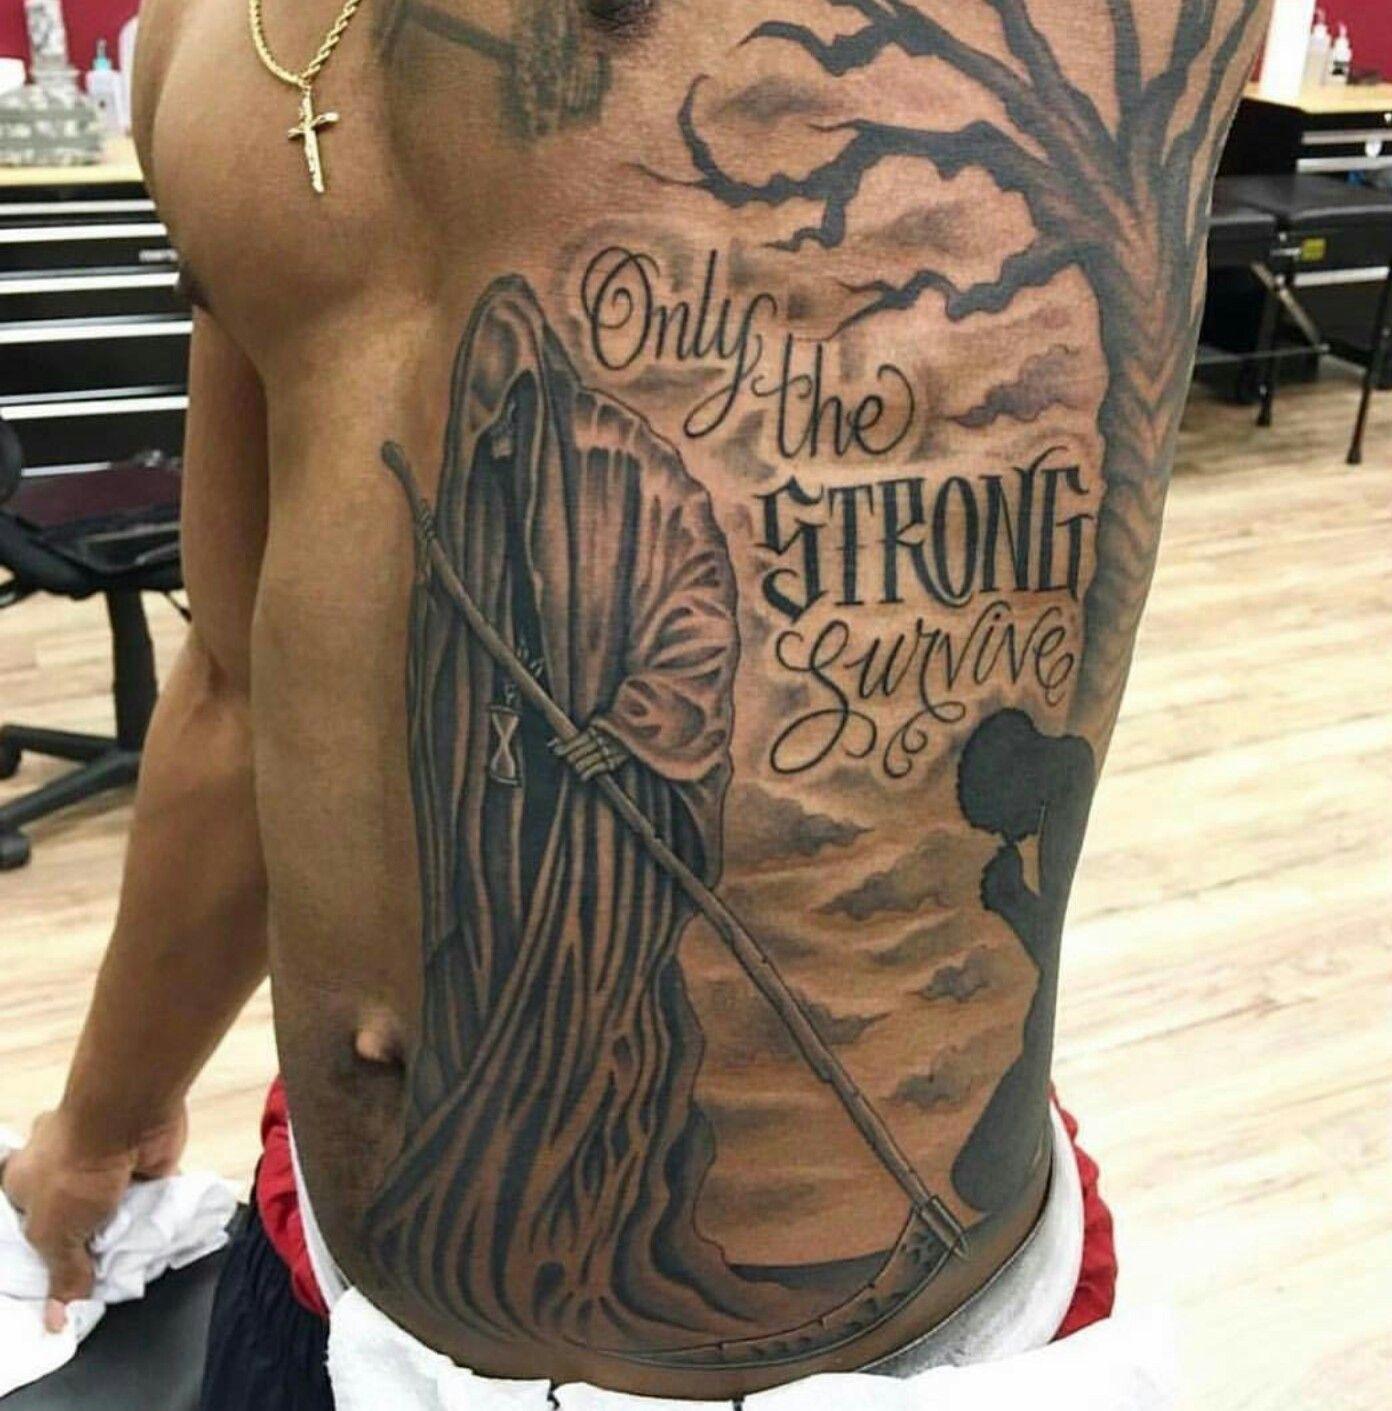 Pin By Samah Garcia On Ideas Tatt Chest Piece Tattoos Torso Tattoos Forearm Sleeve Tattoos